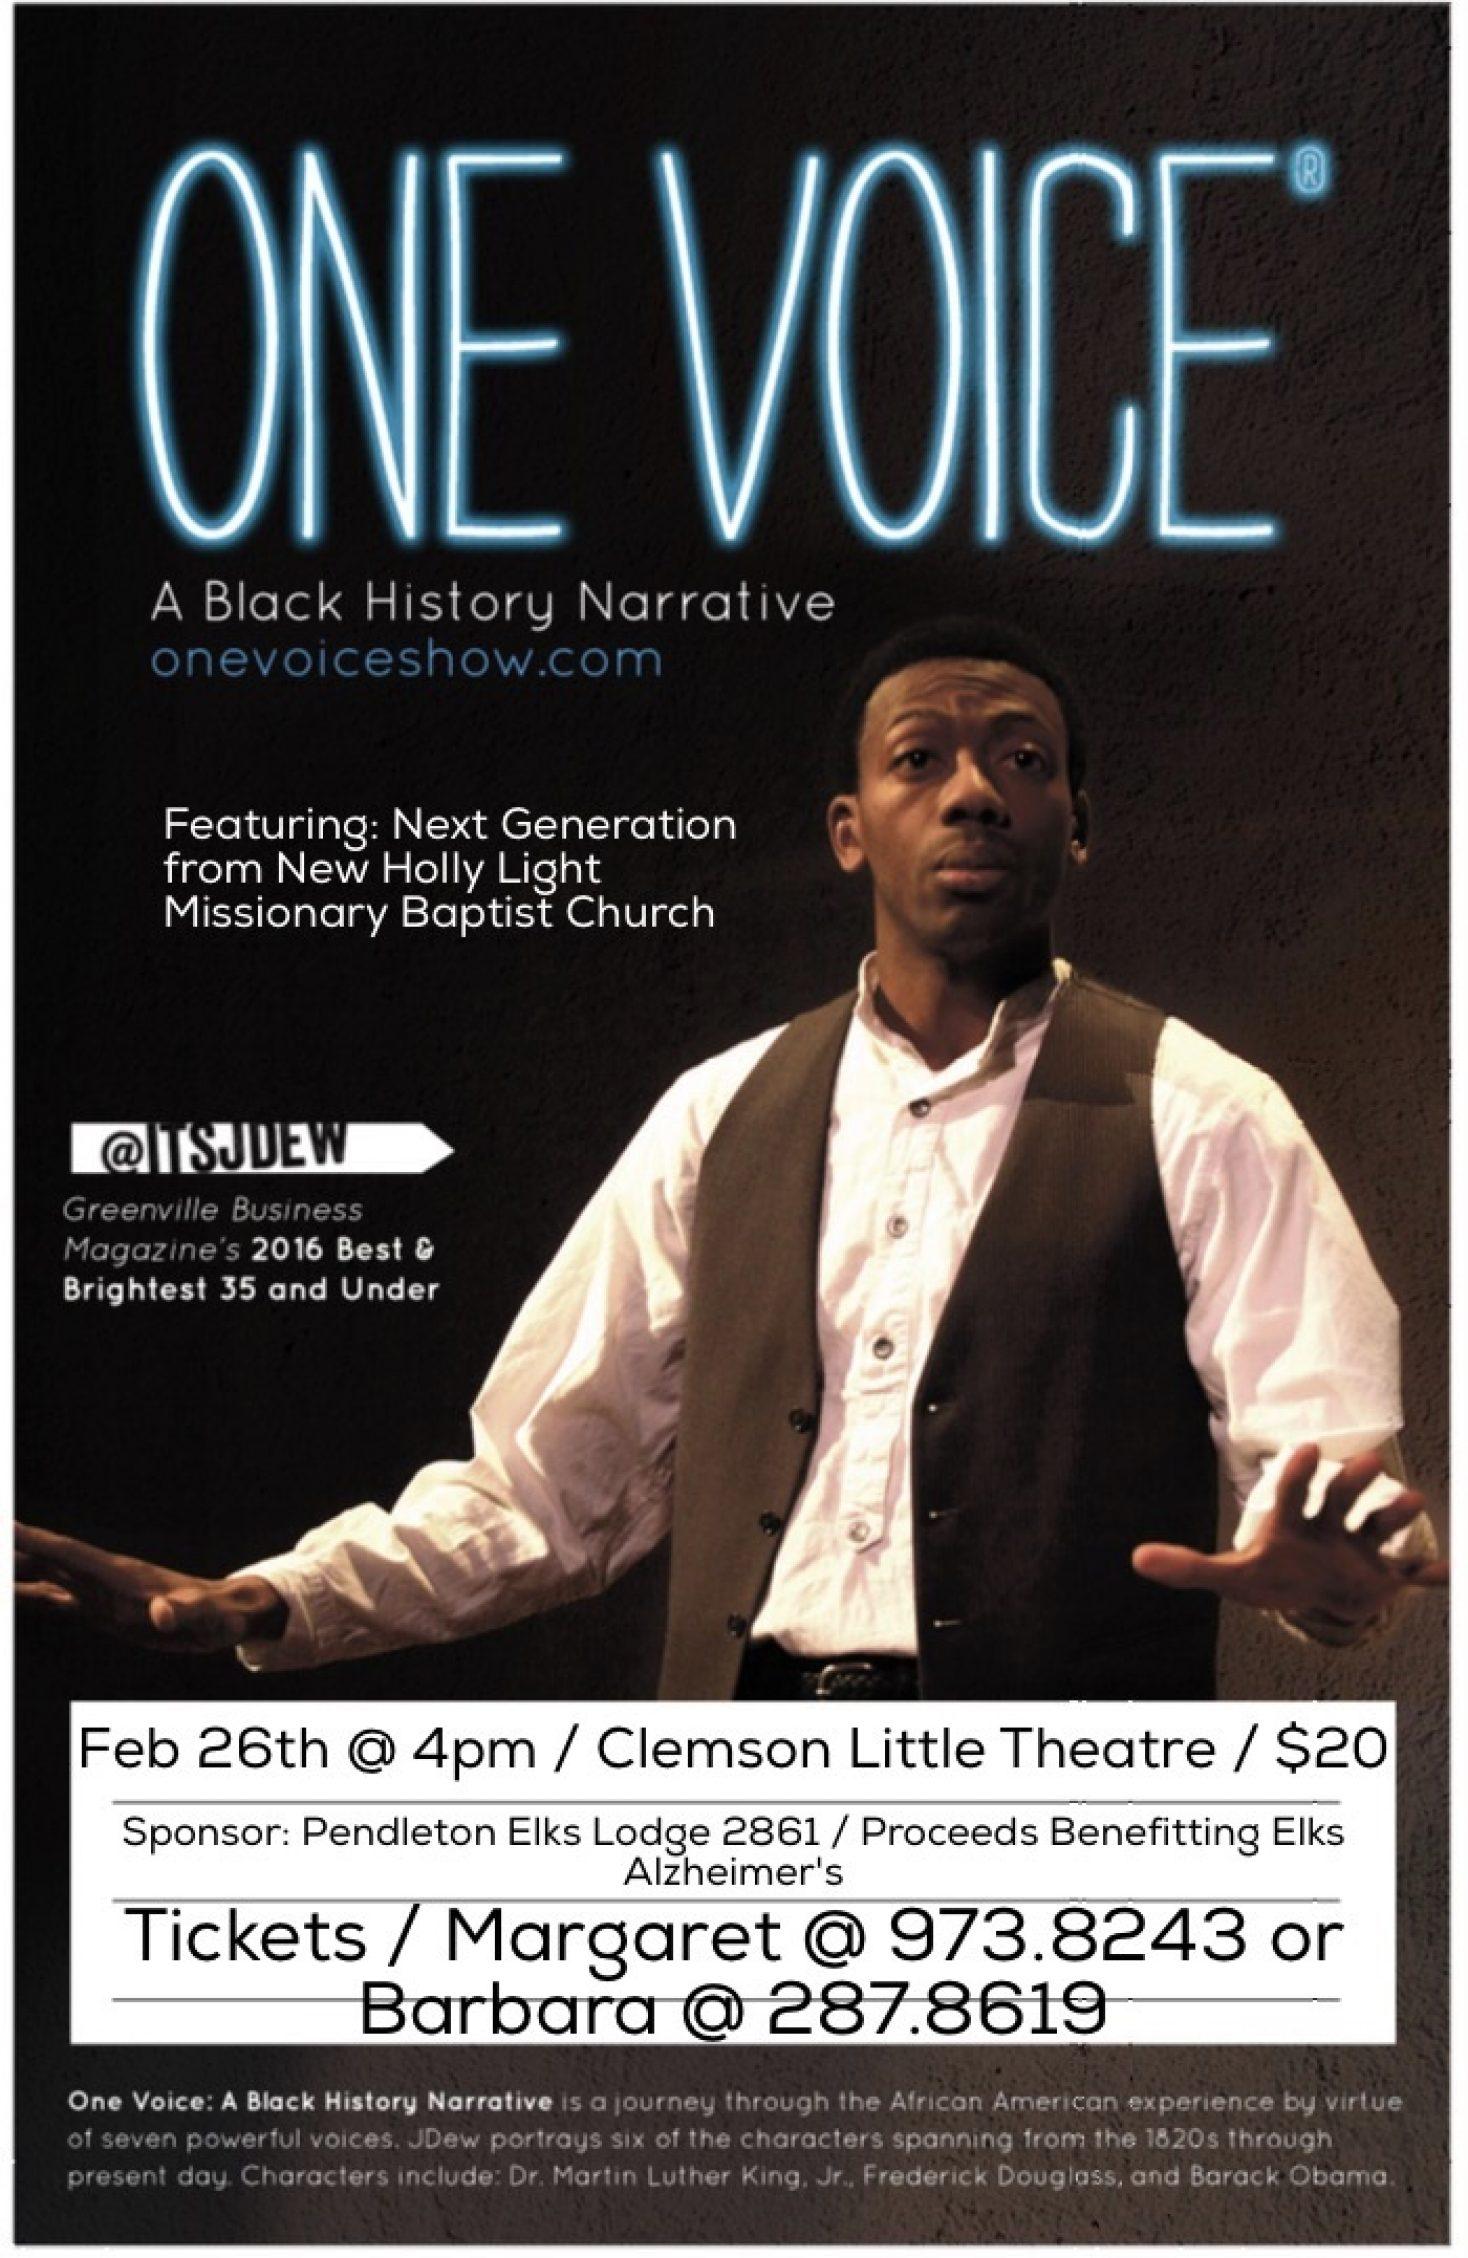 One Voice A Black History Narrative